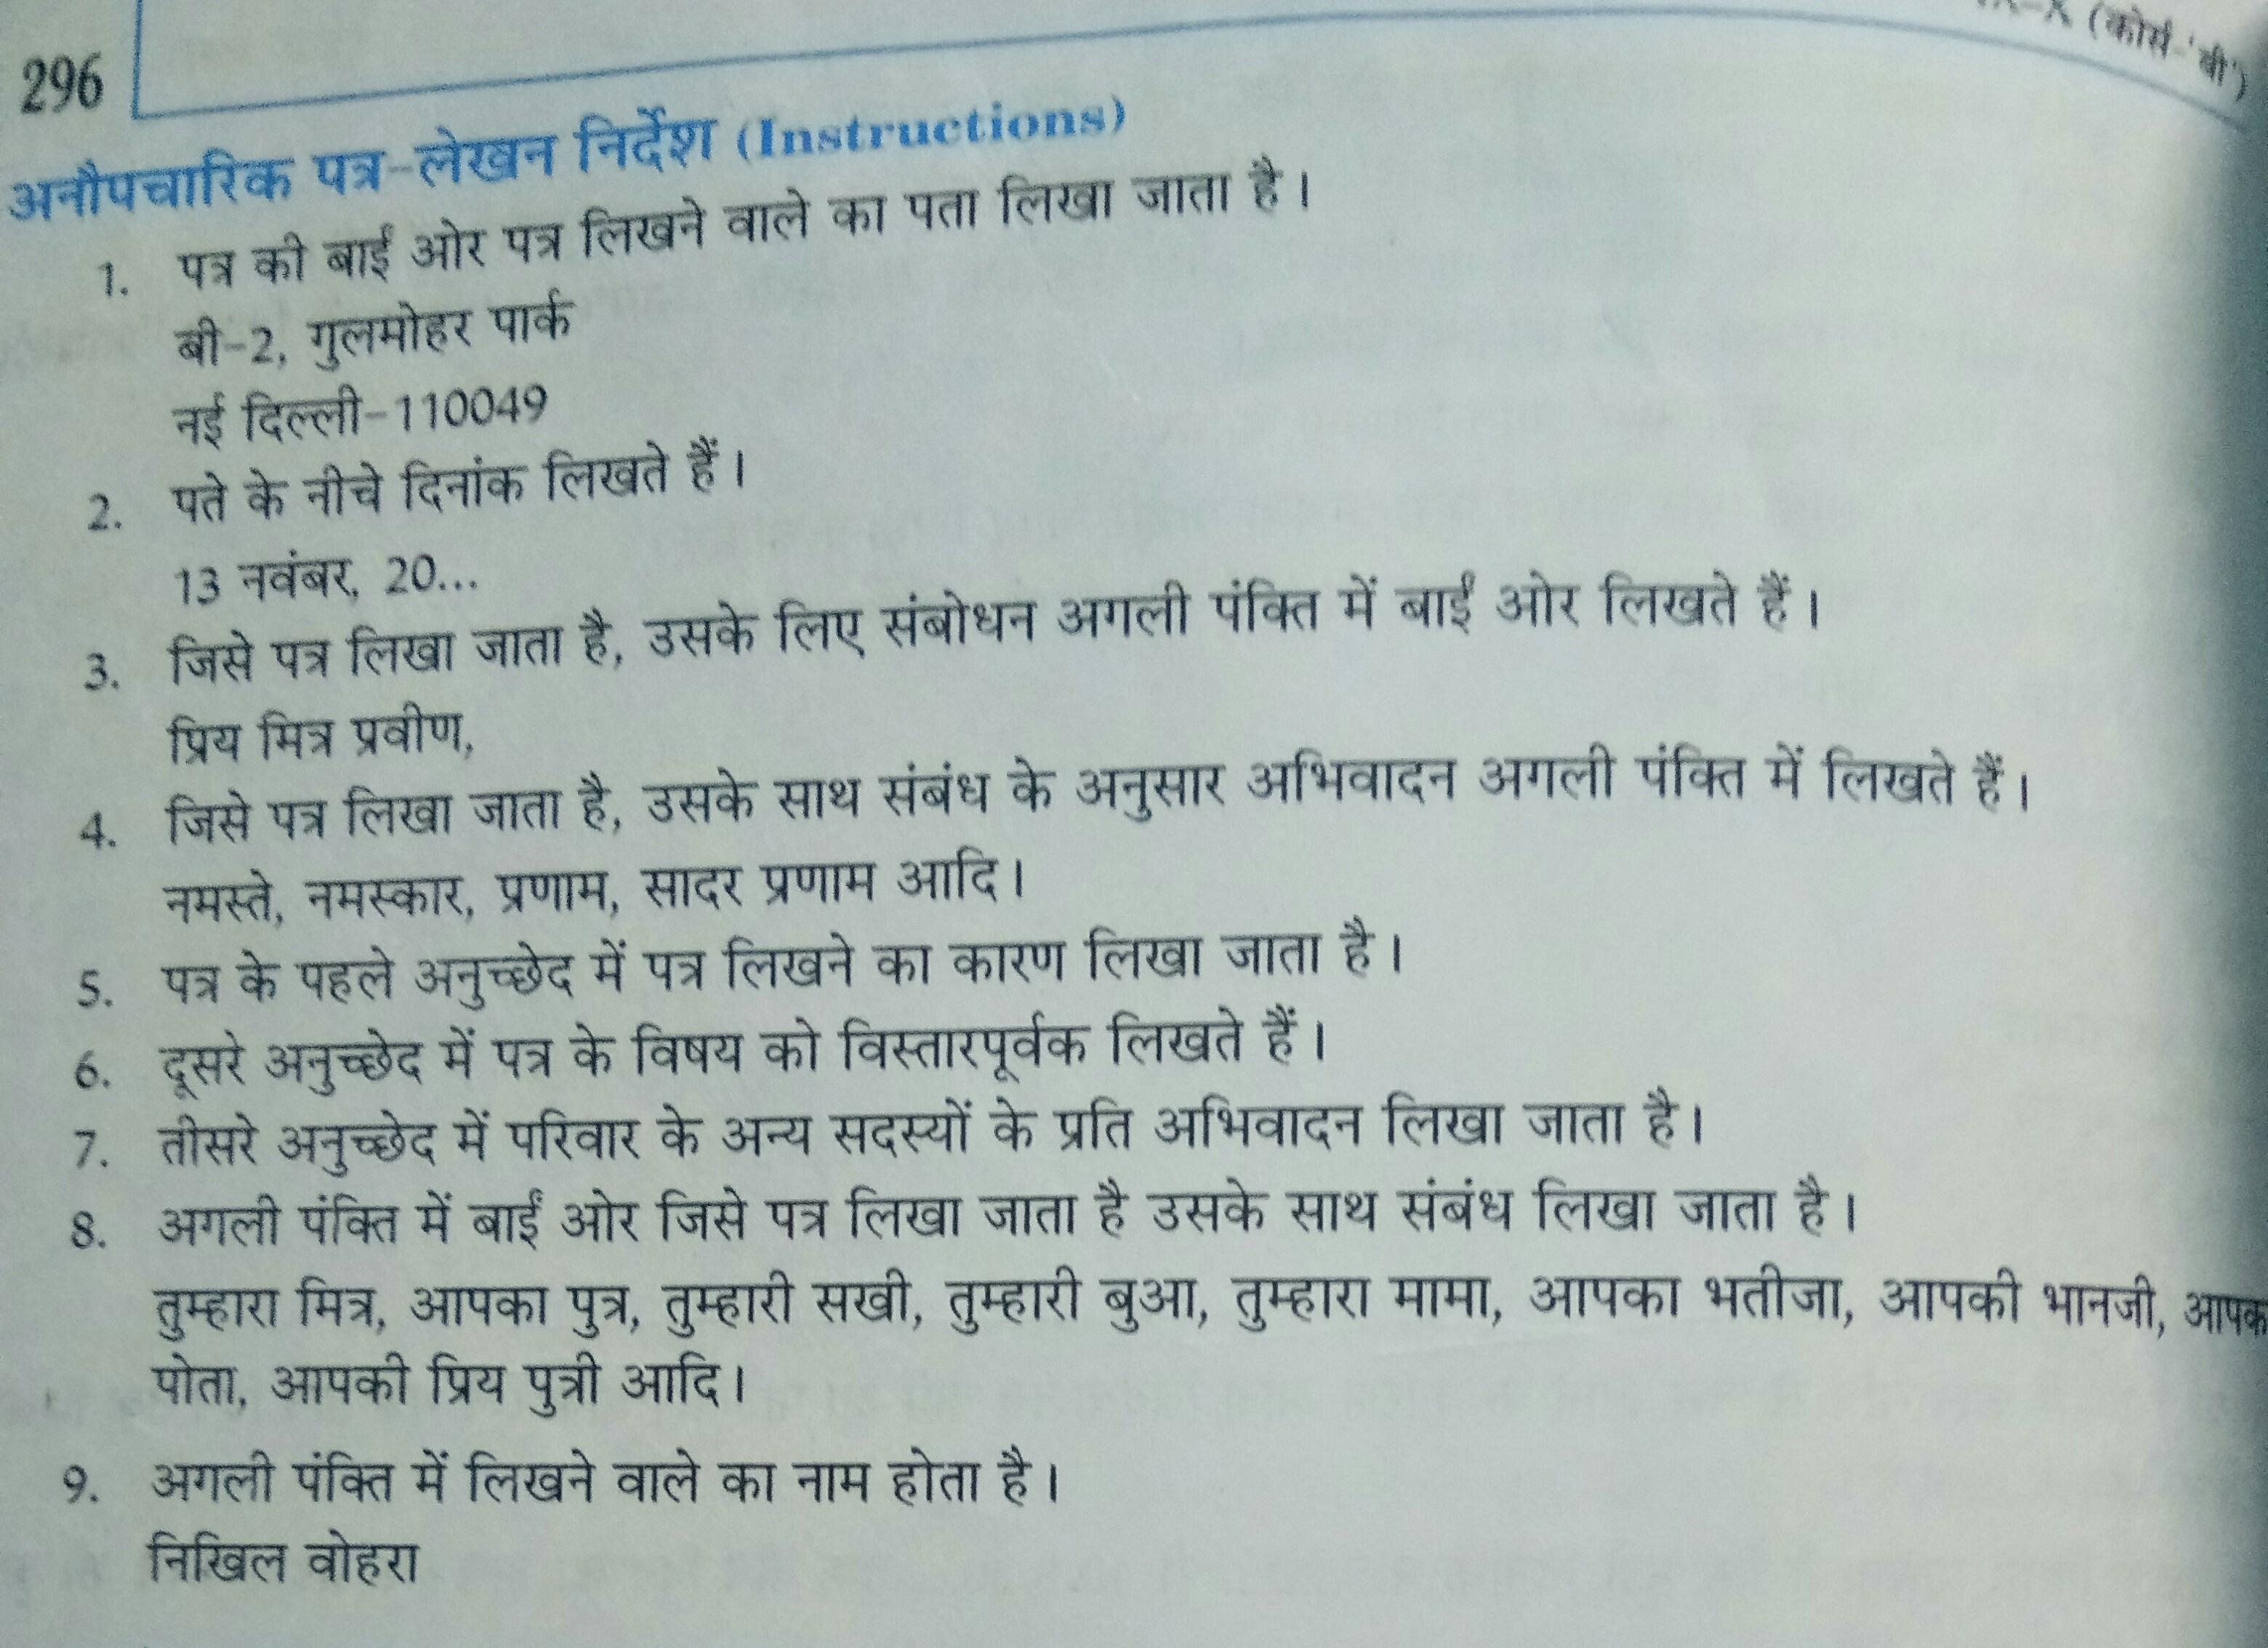 Format of informal letter in hindi brainly download jpg altavistaventures Choice Image